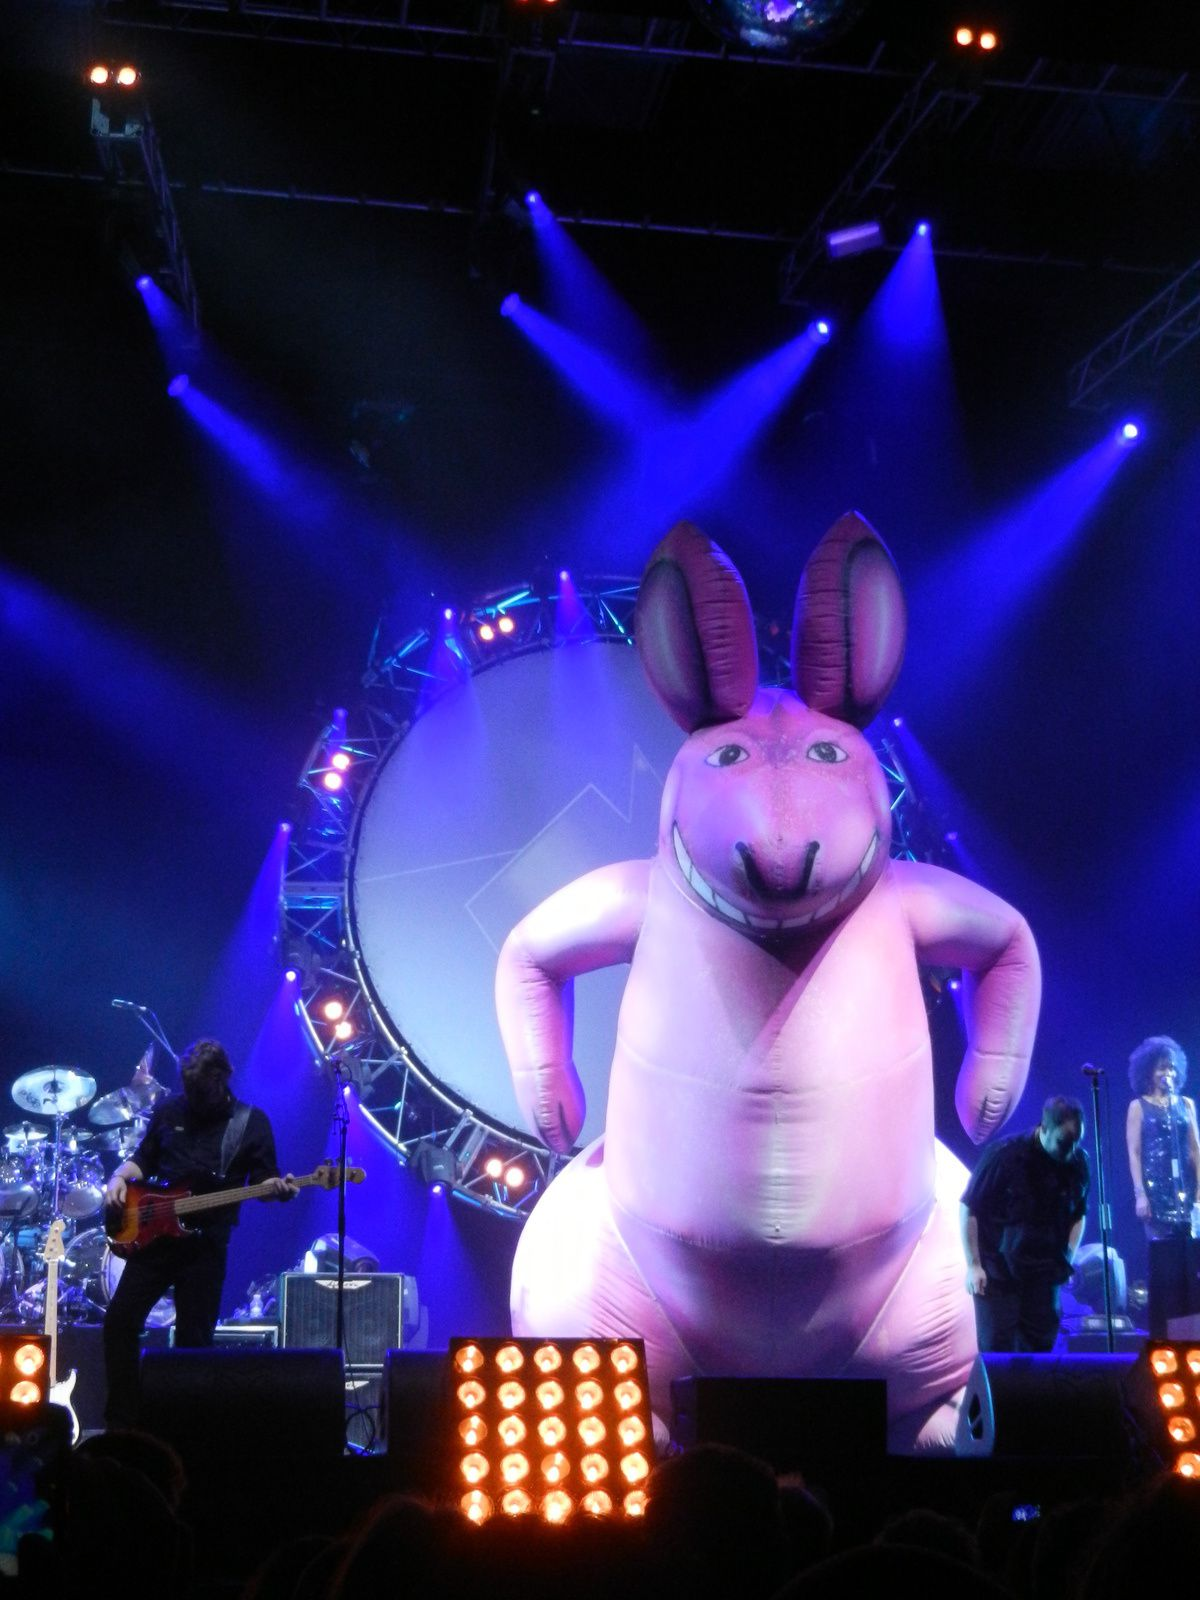 Mercredi 28 janvier 2015 Zénith d'Orléans : The Australian Pink Floyd Show  - Magiclilive is good for you